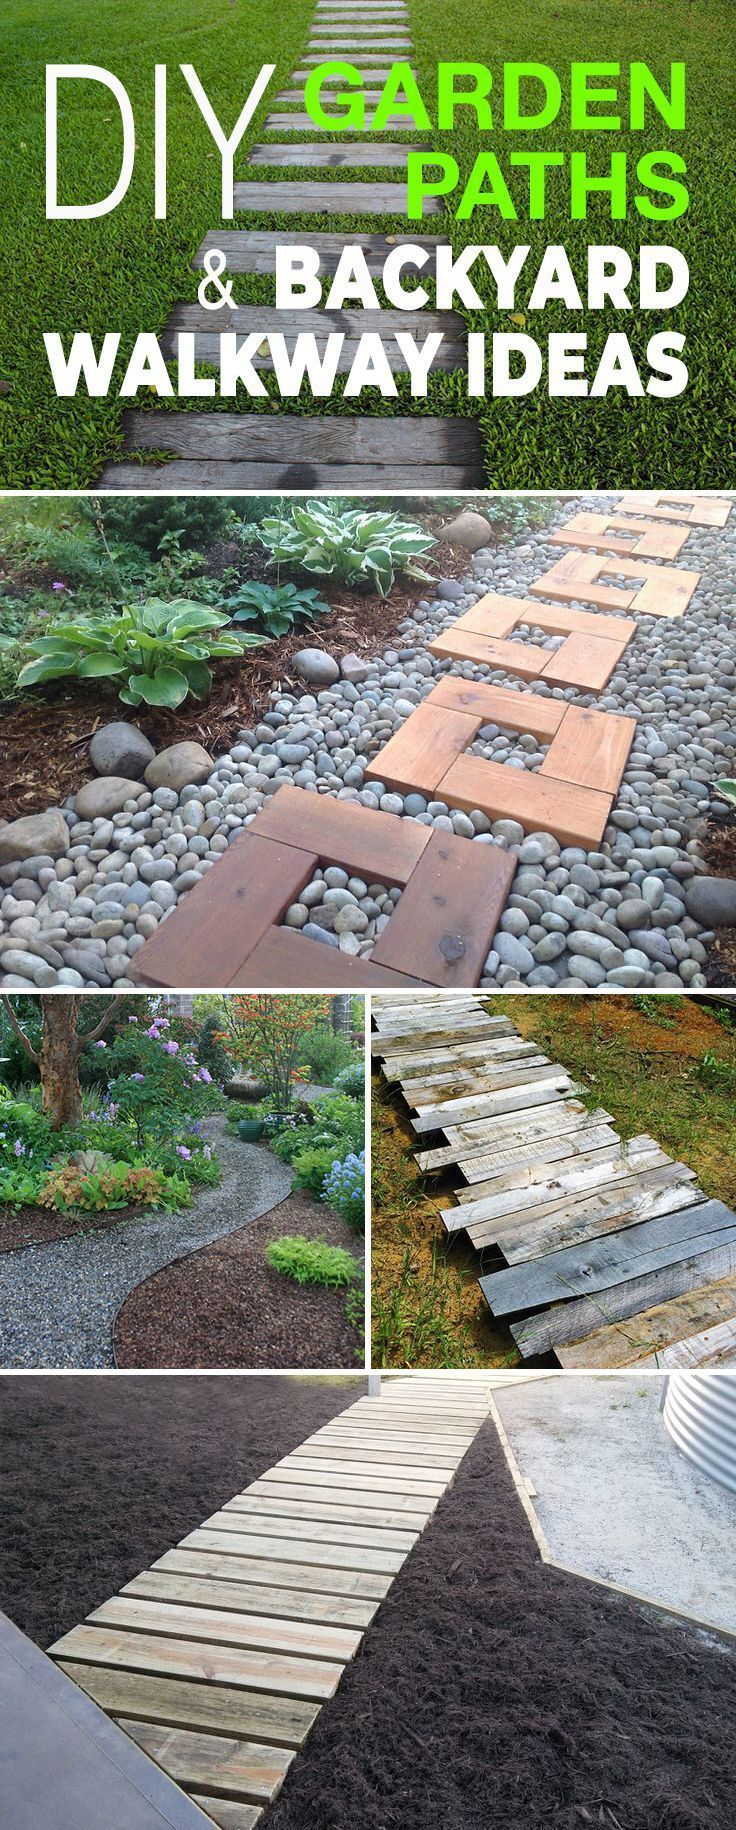 Diy Garden Paths And Backyard Walkway Ideas The Garden Glove Backyard Walkway Garden Paths Easy Garden Backyard diy stepping stones